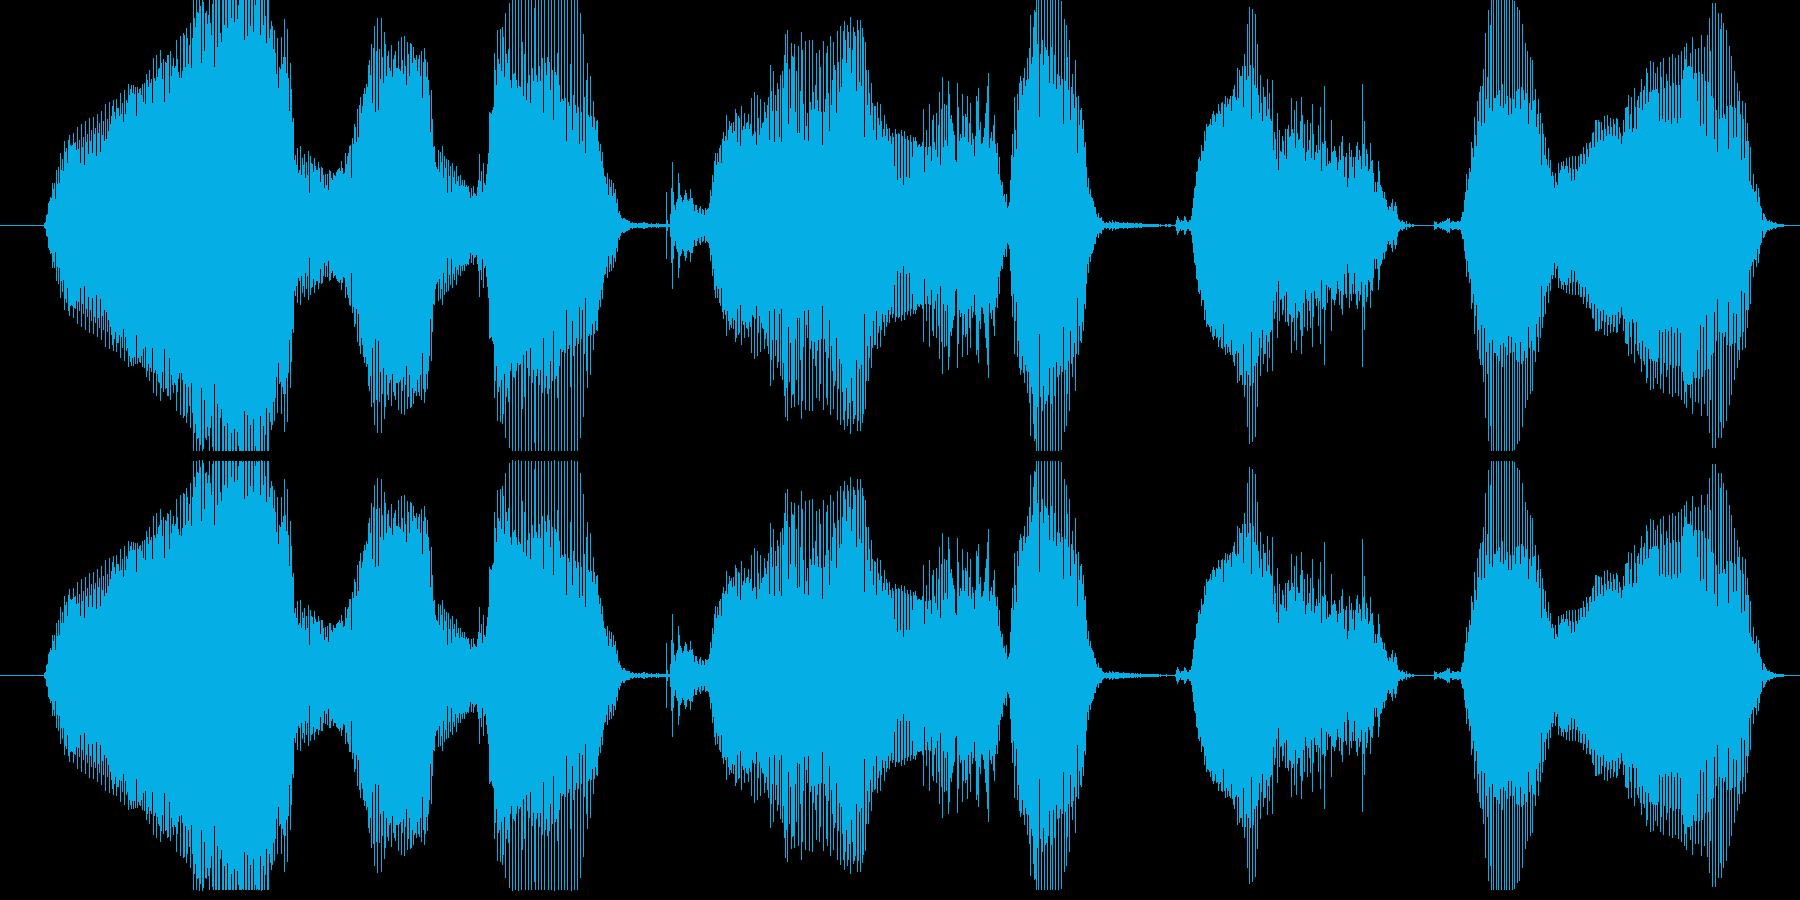 WEBで検索してねの再生済みの波形